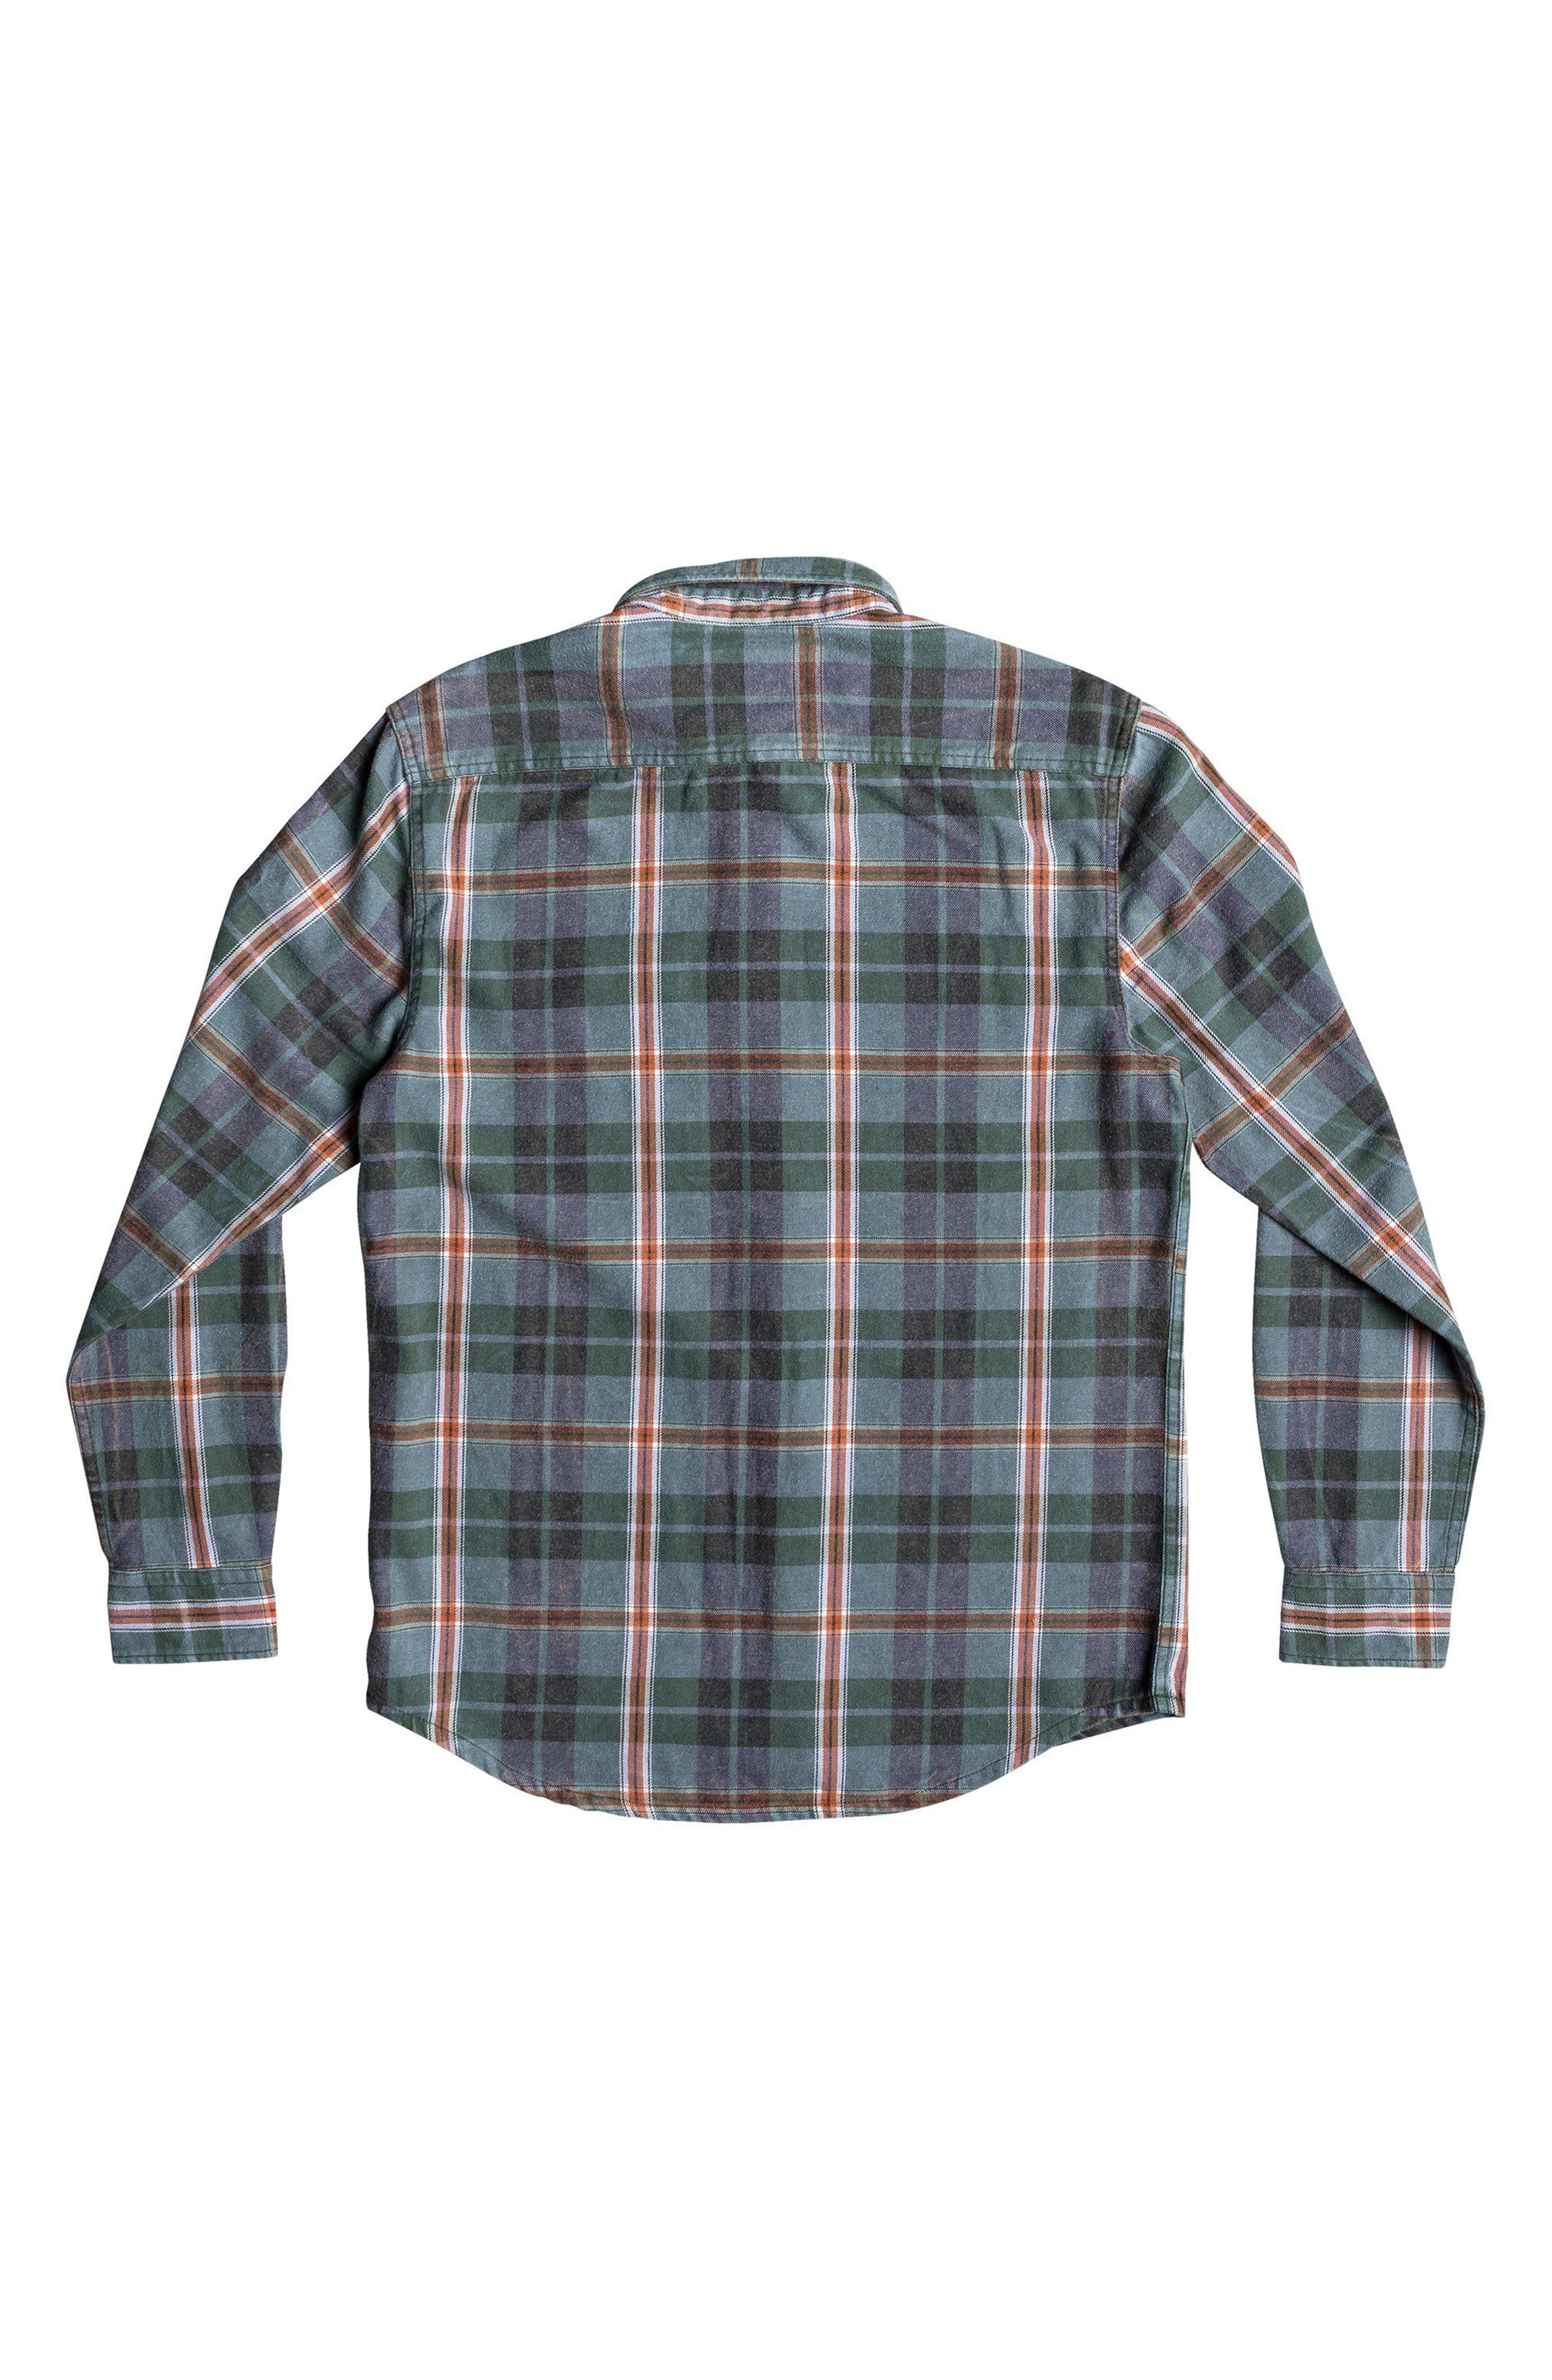 Super Tang Flannel Shirt,                             Alternate thumbnail 8, color,                             STONE WASH TANG